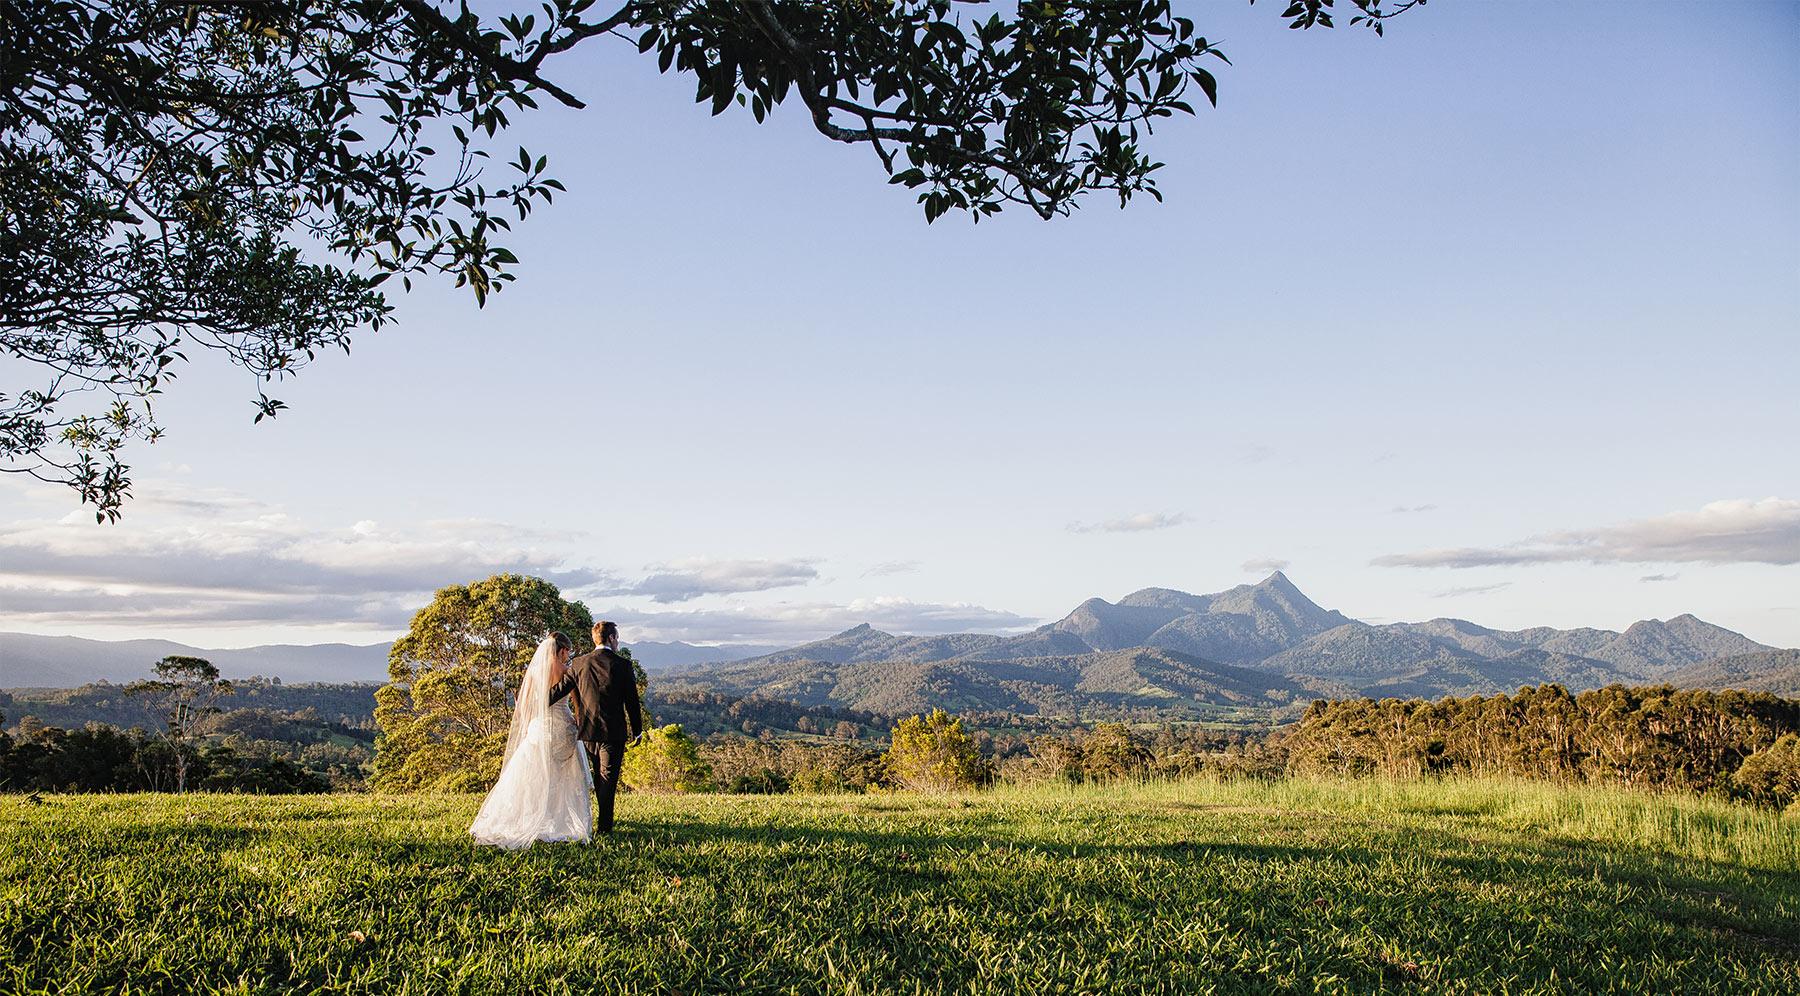 Gold Coast beach wedding photography & videography